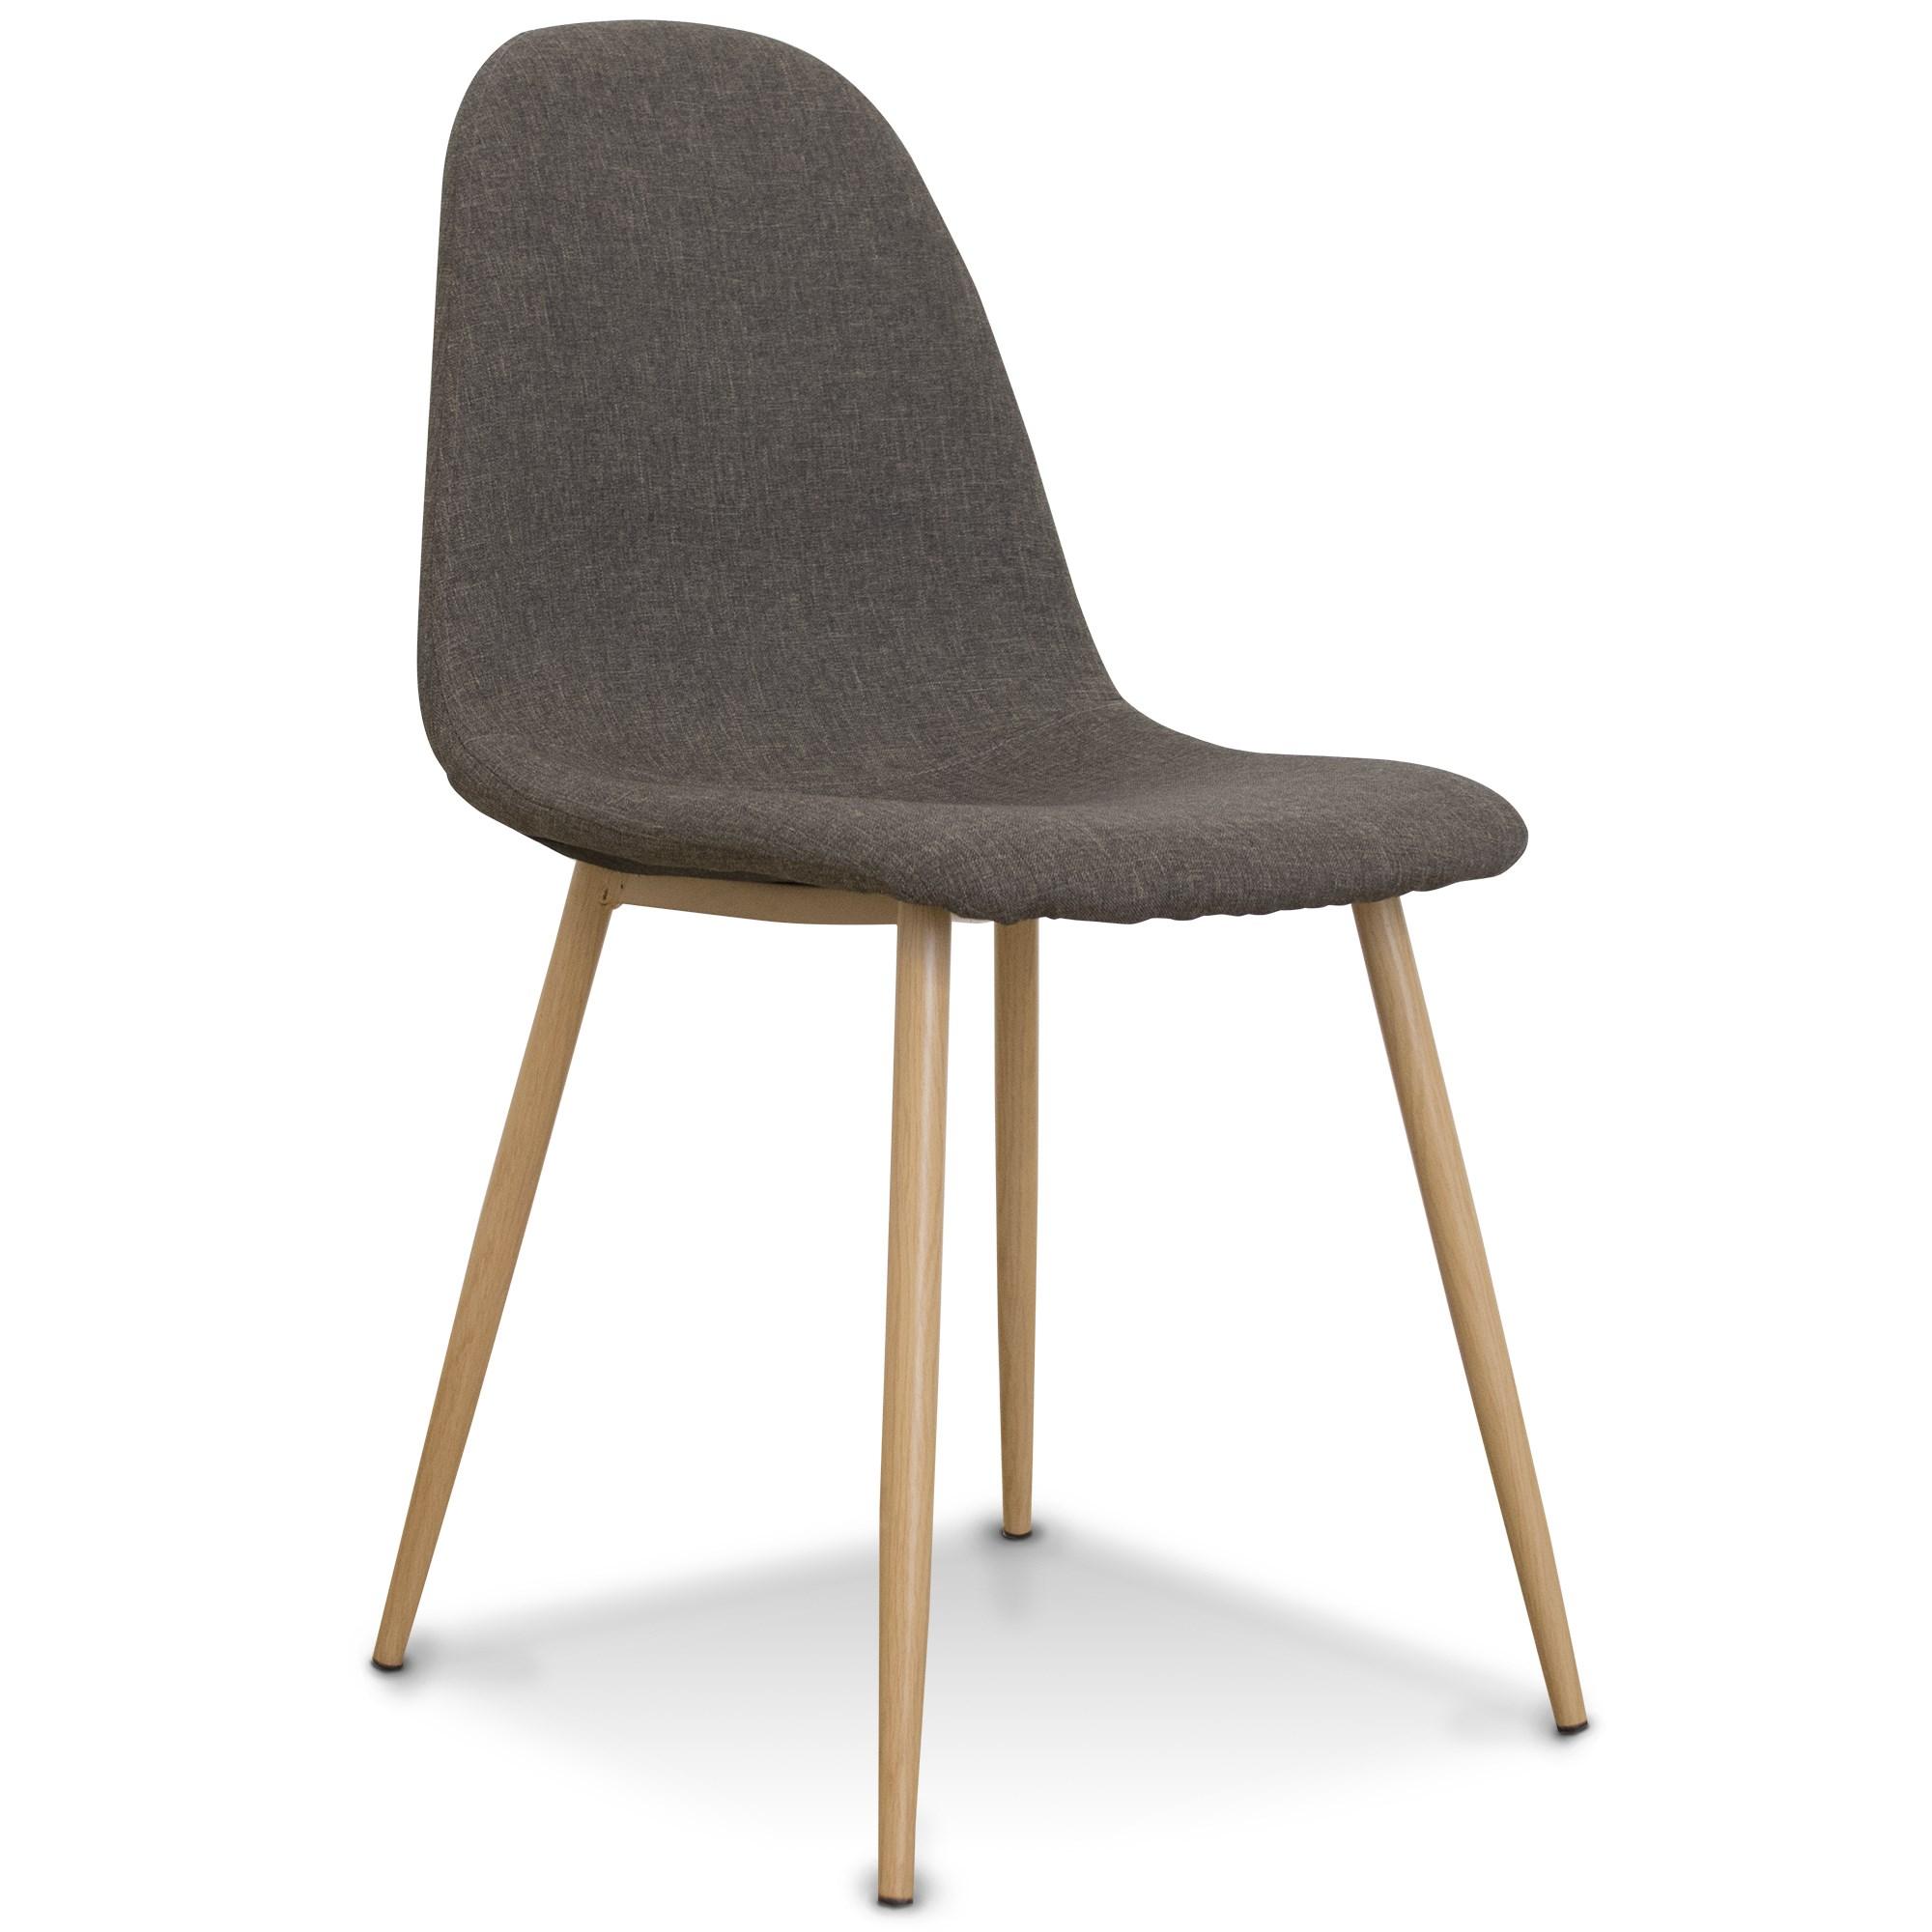 Unik MILOS SPISESTUESTOL - My Home Møbler TA95